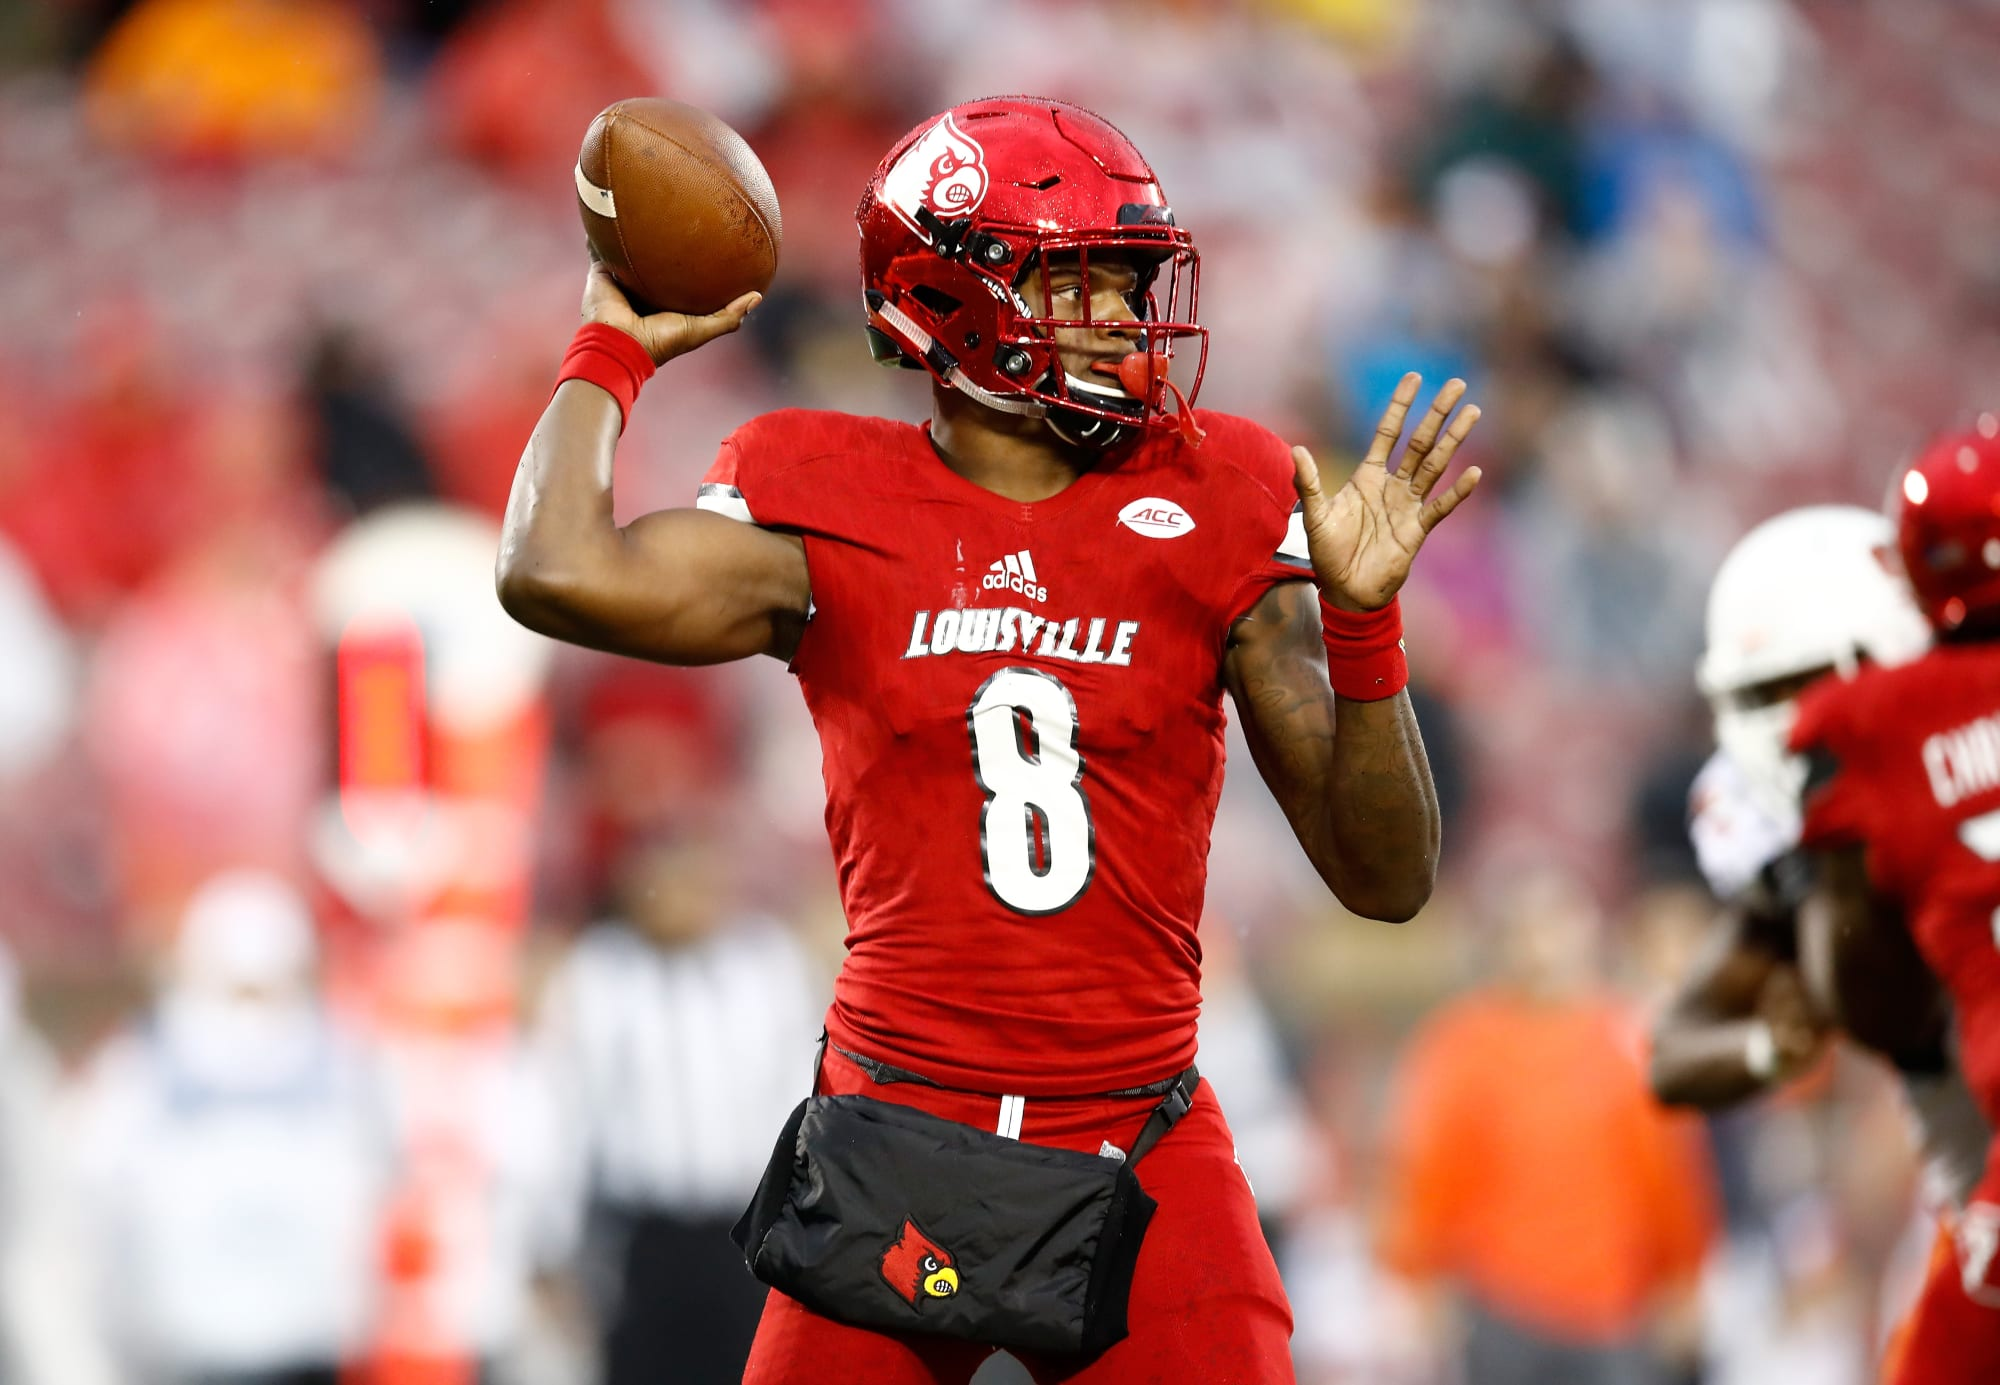 2018 Nfl Draft Louisville Qb Lamar Jackson Penalized For Fight